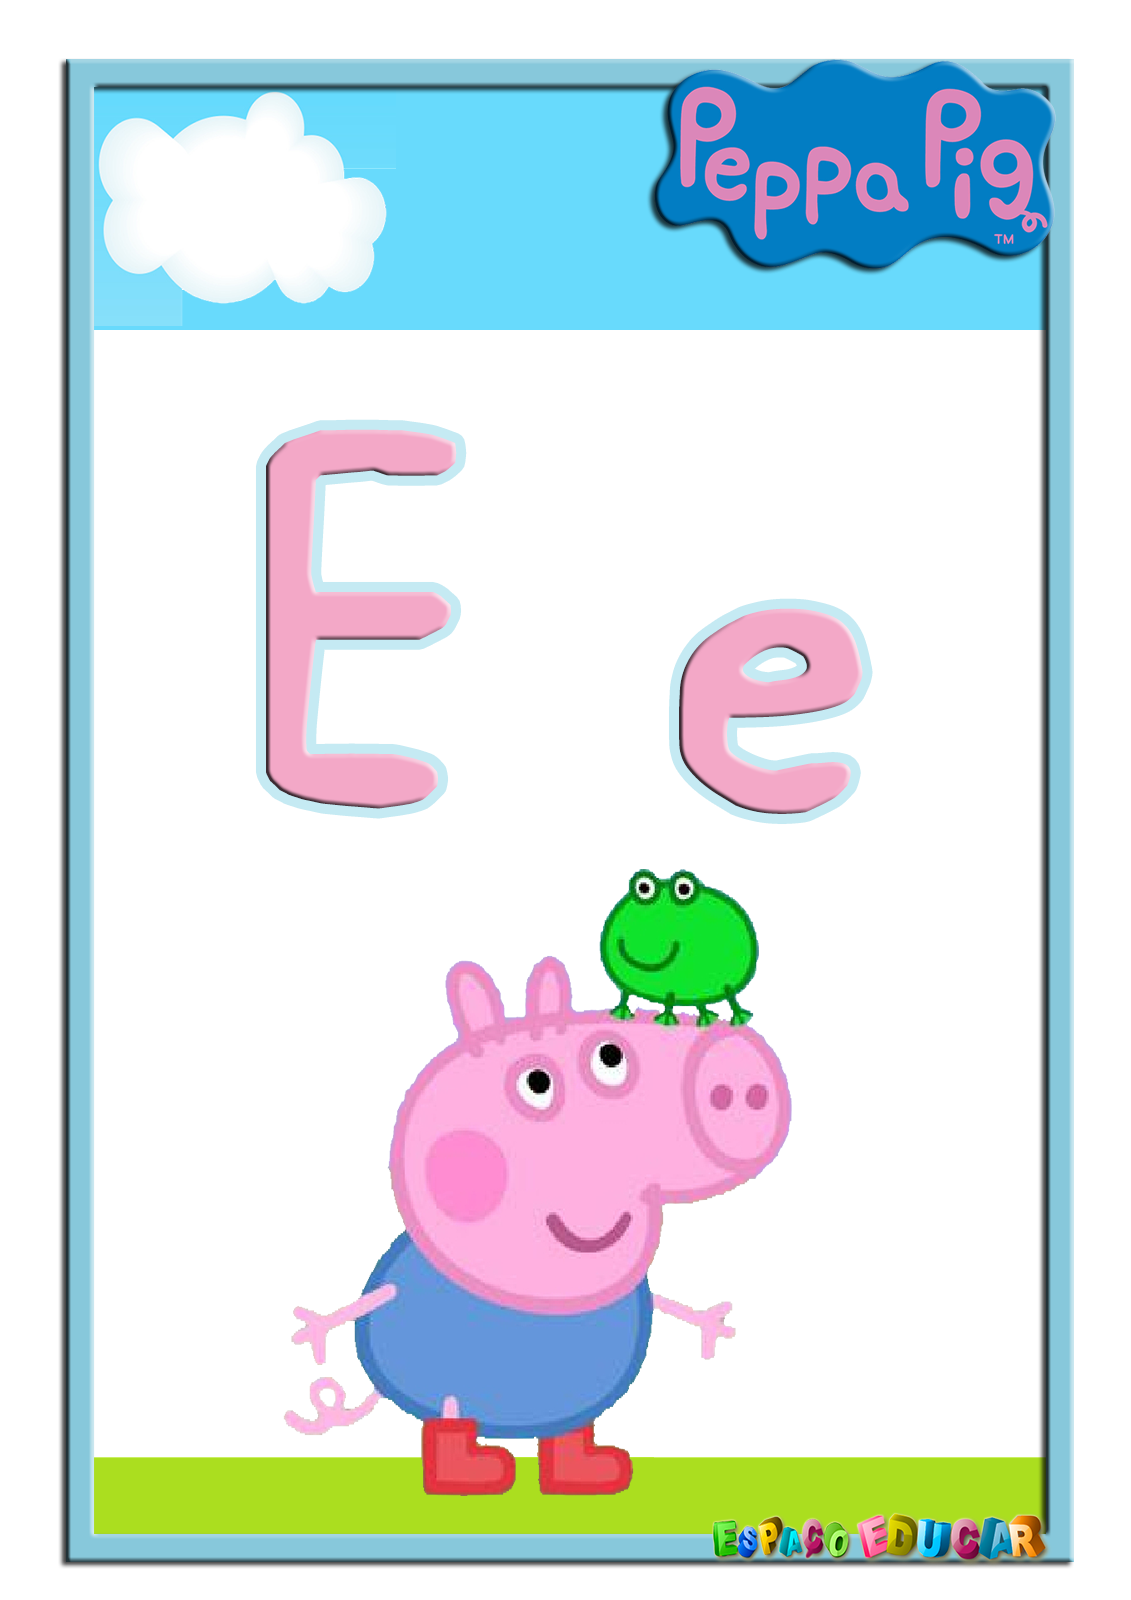 Alfabeto de peppa y. Clipart pig rectangle